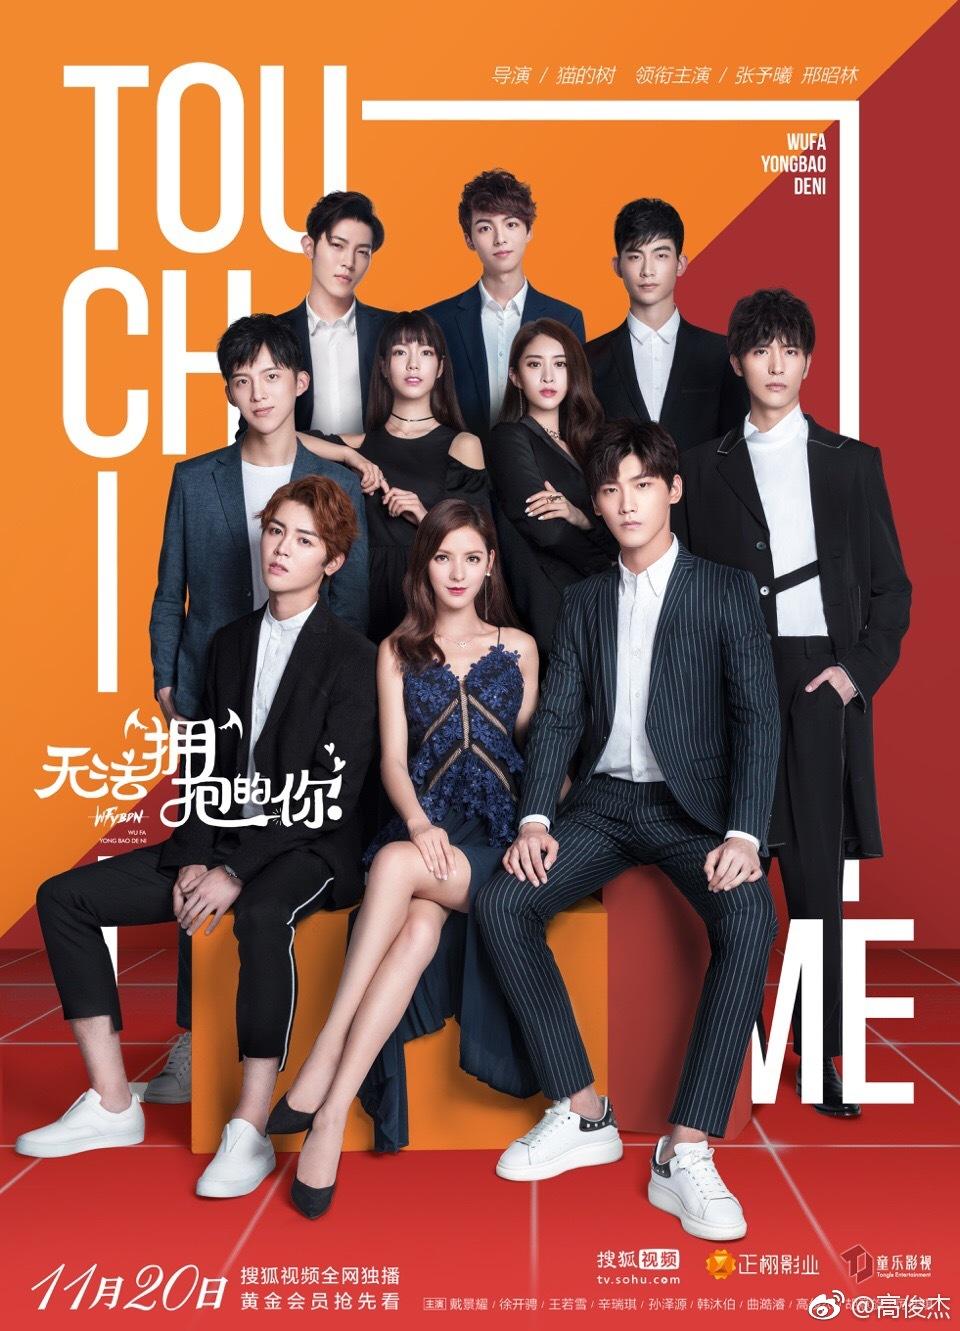 دانلود فصل دوم سریال چینی نمیتونم بغلت کنم I Cannot Hug You: Season 2 2018